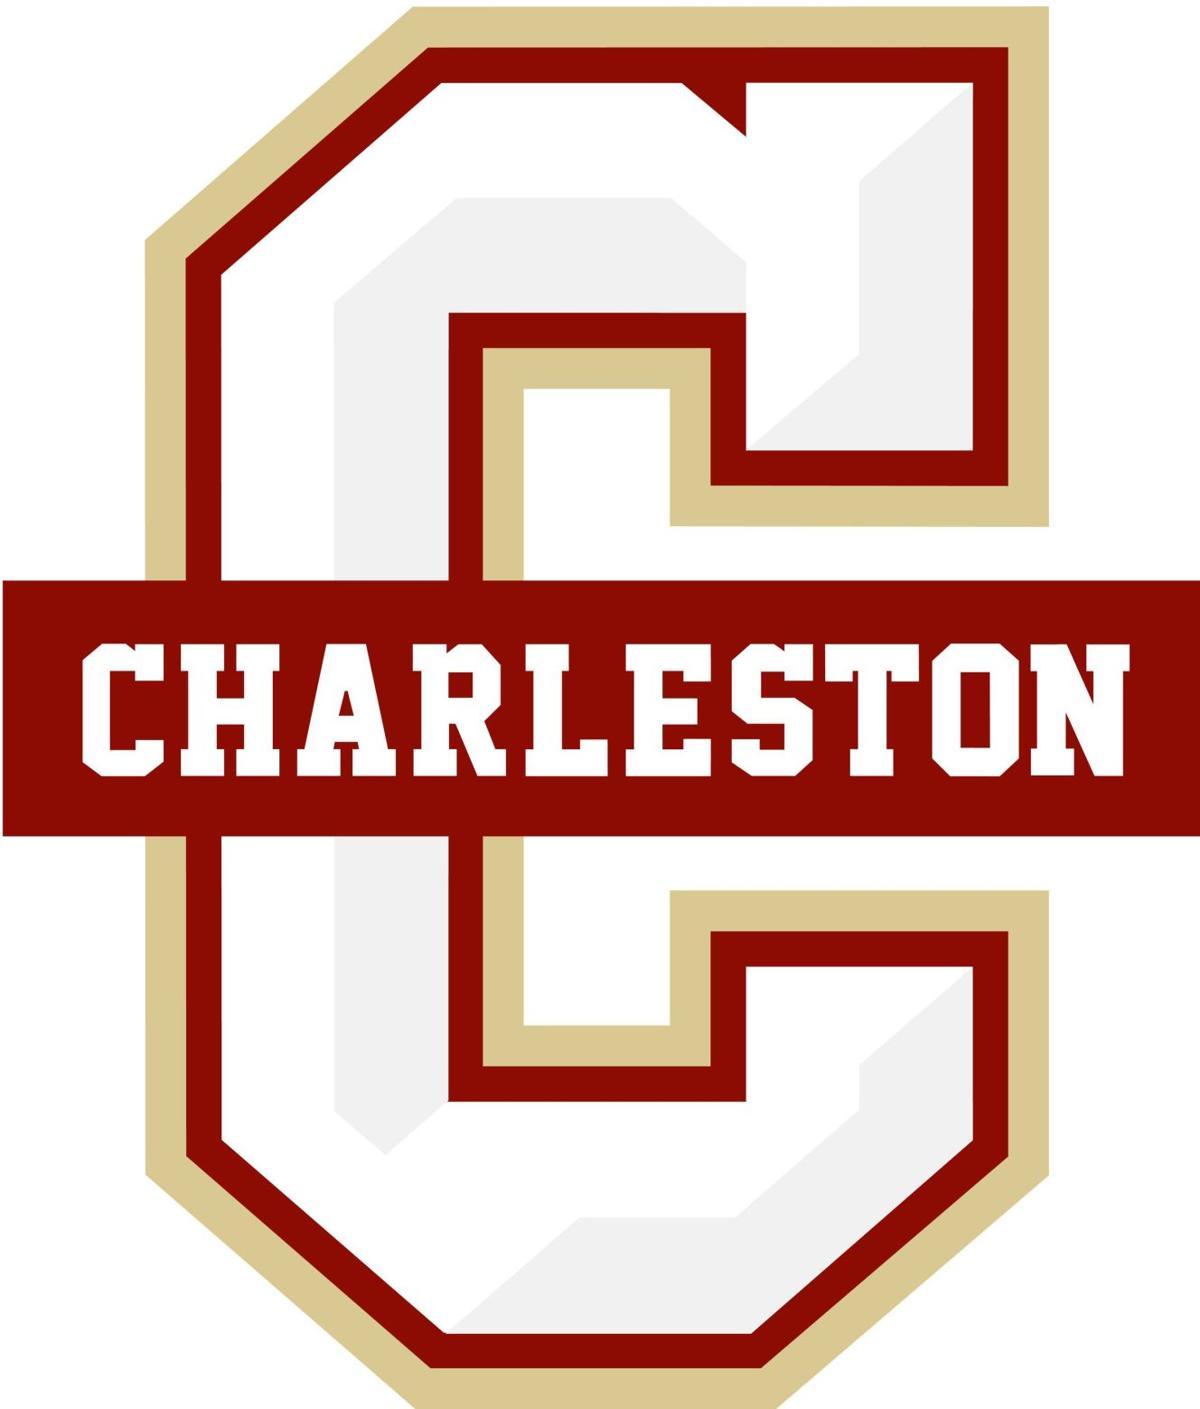 Towson edges College of Charleston, 74-70